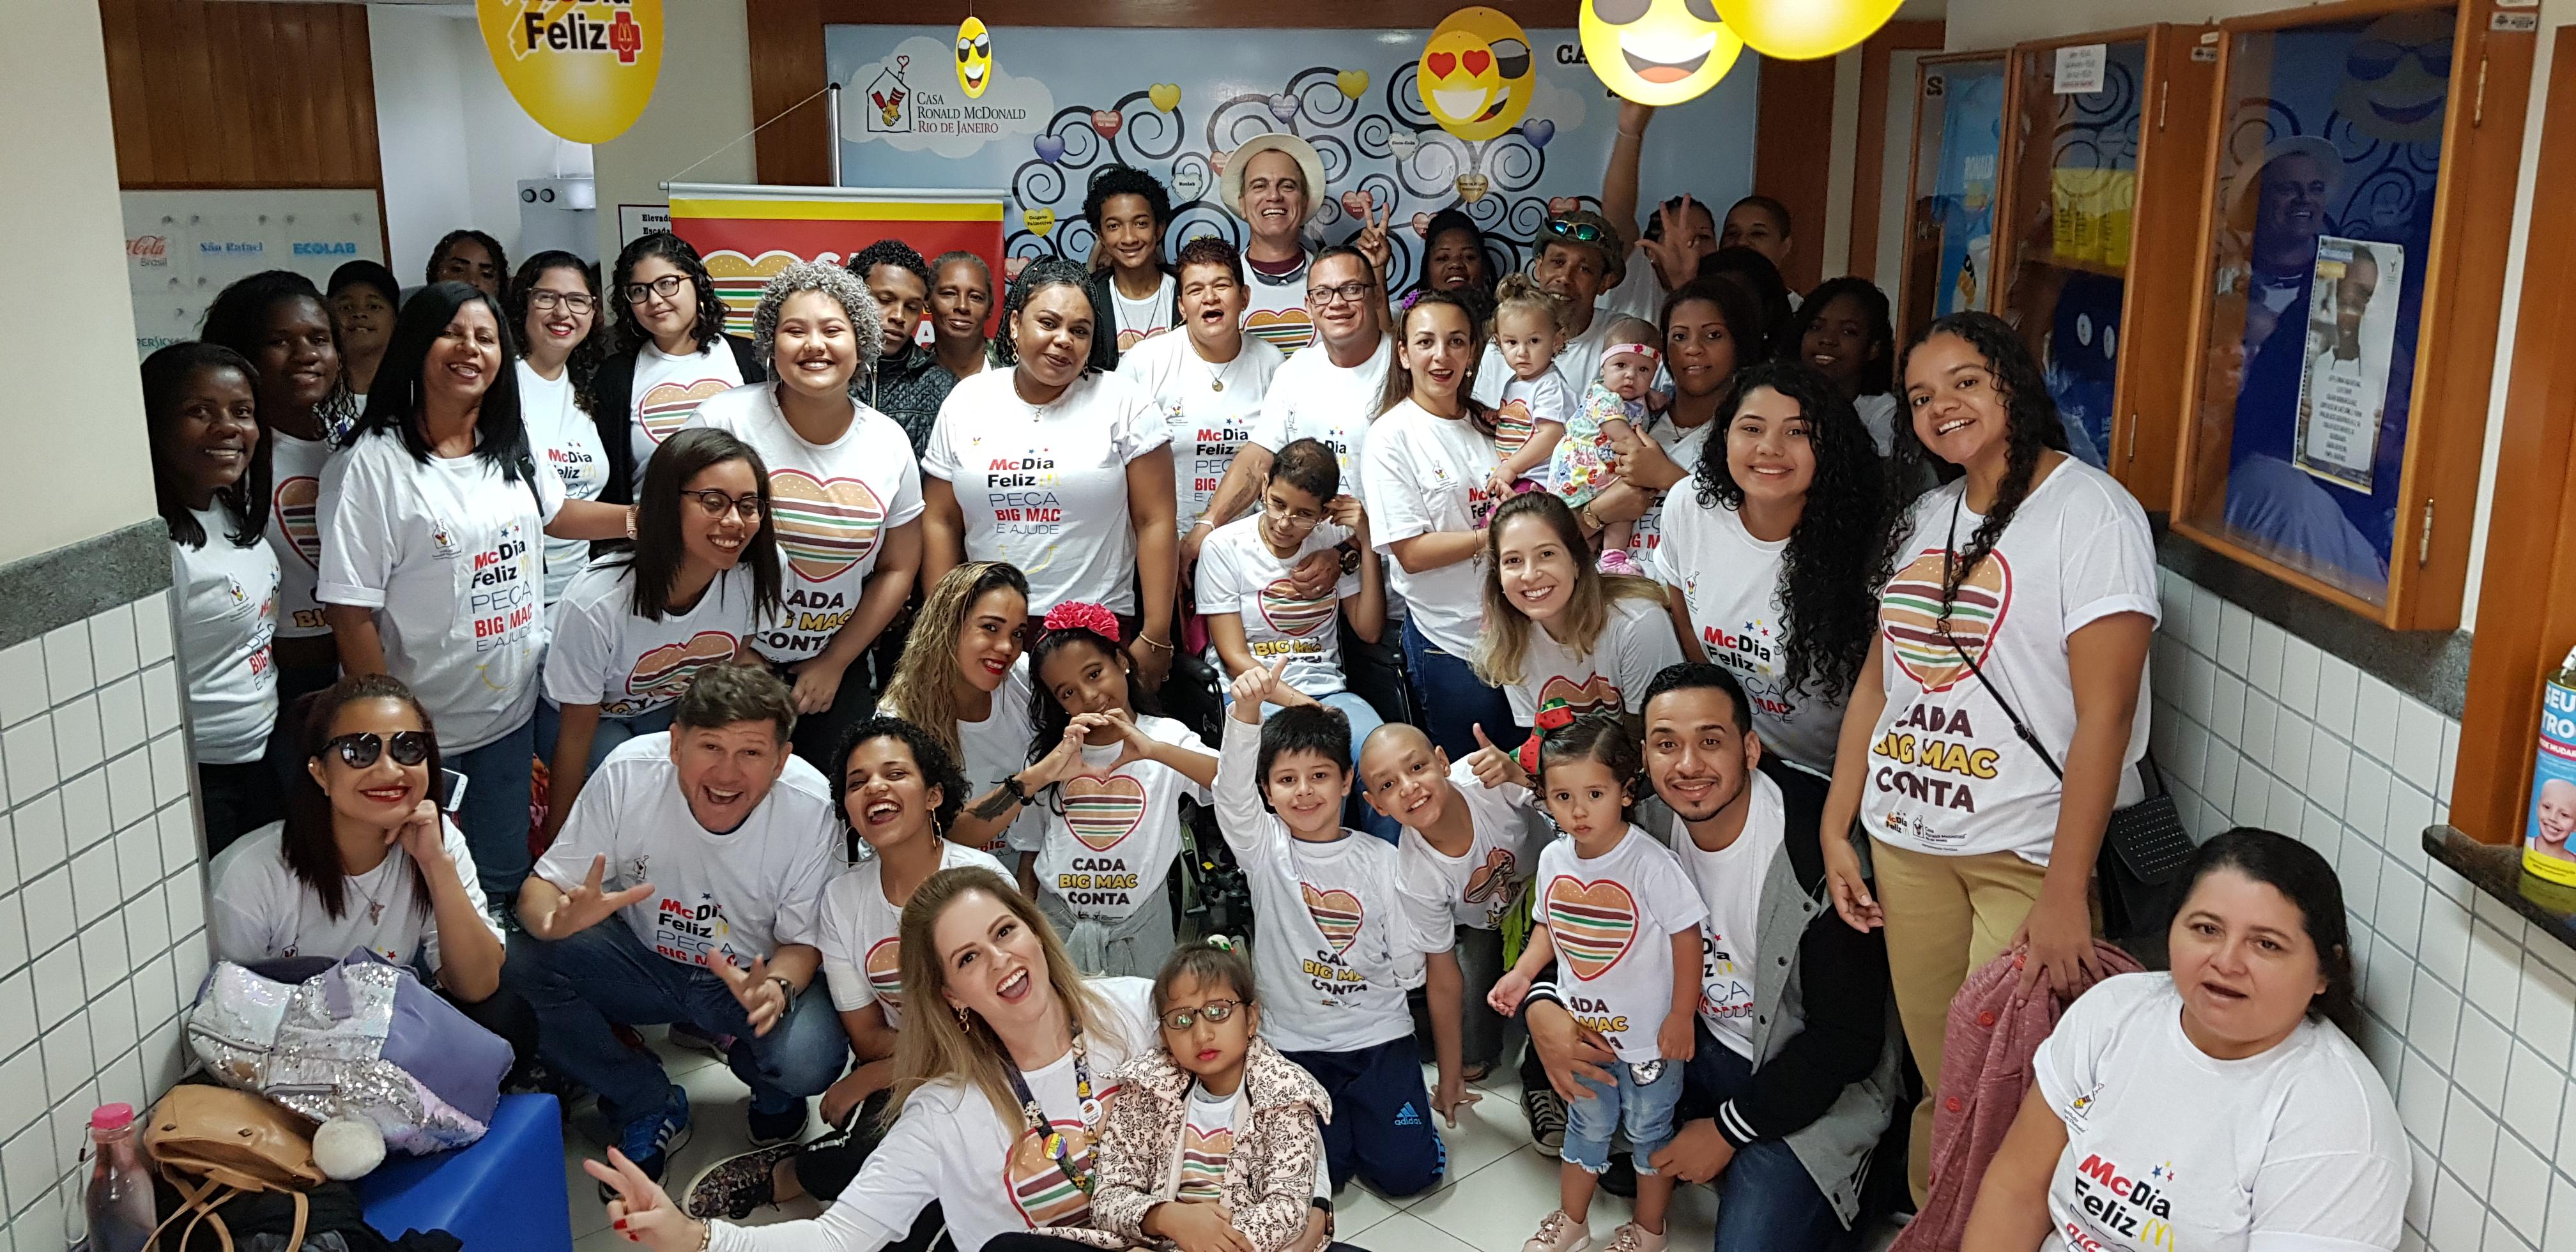 Equipe Casa Ronald McDonald - Rio de Janeiro